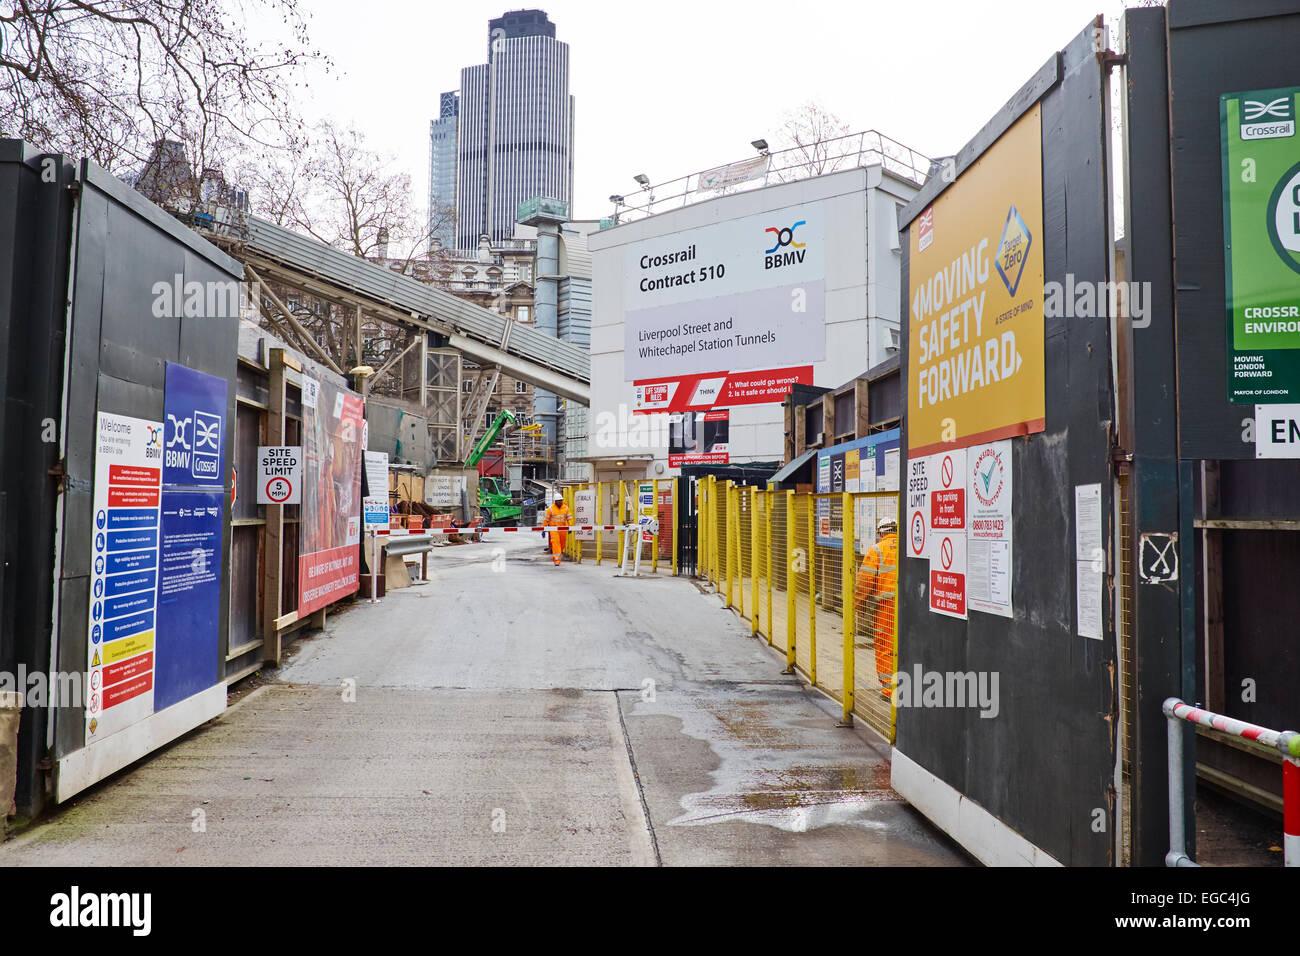 Construction Site Of Liverpool Street & Whitechapel Tunnels Crossrail Finsbury Circus London UK - Stock Image